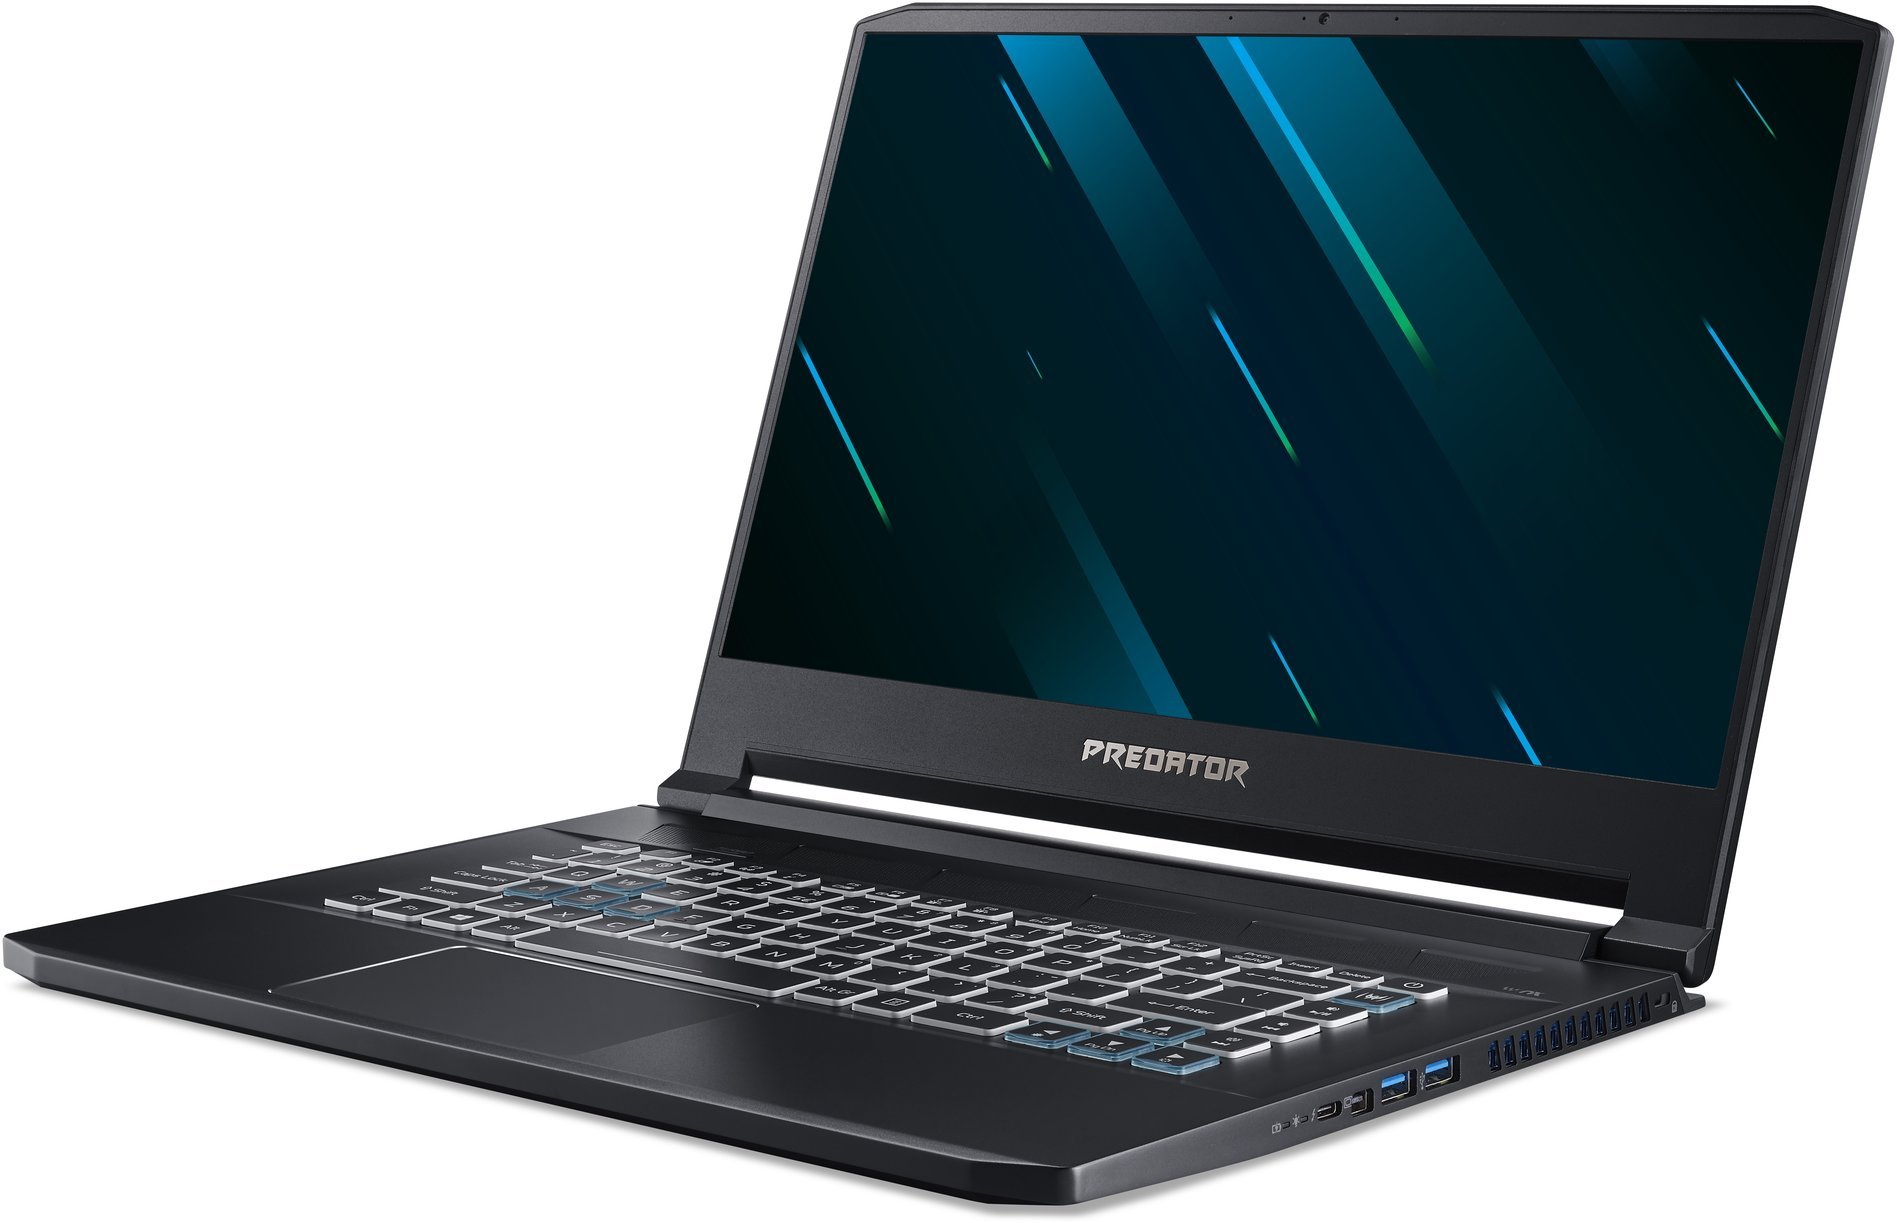 Acer Predator Triton 500 PT515-52-73UN